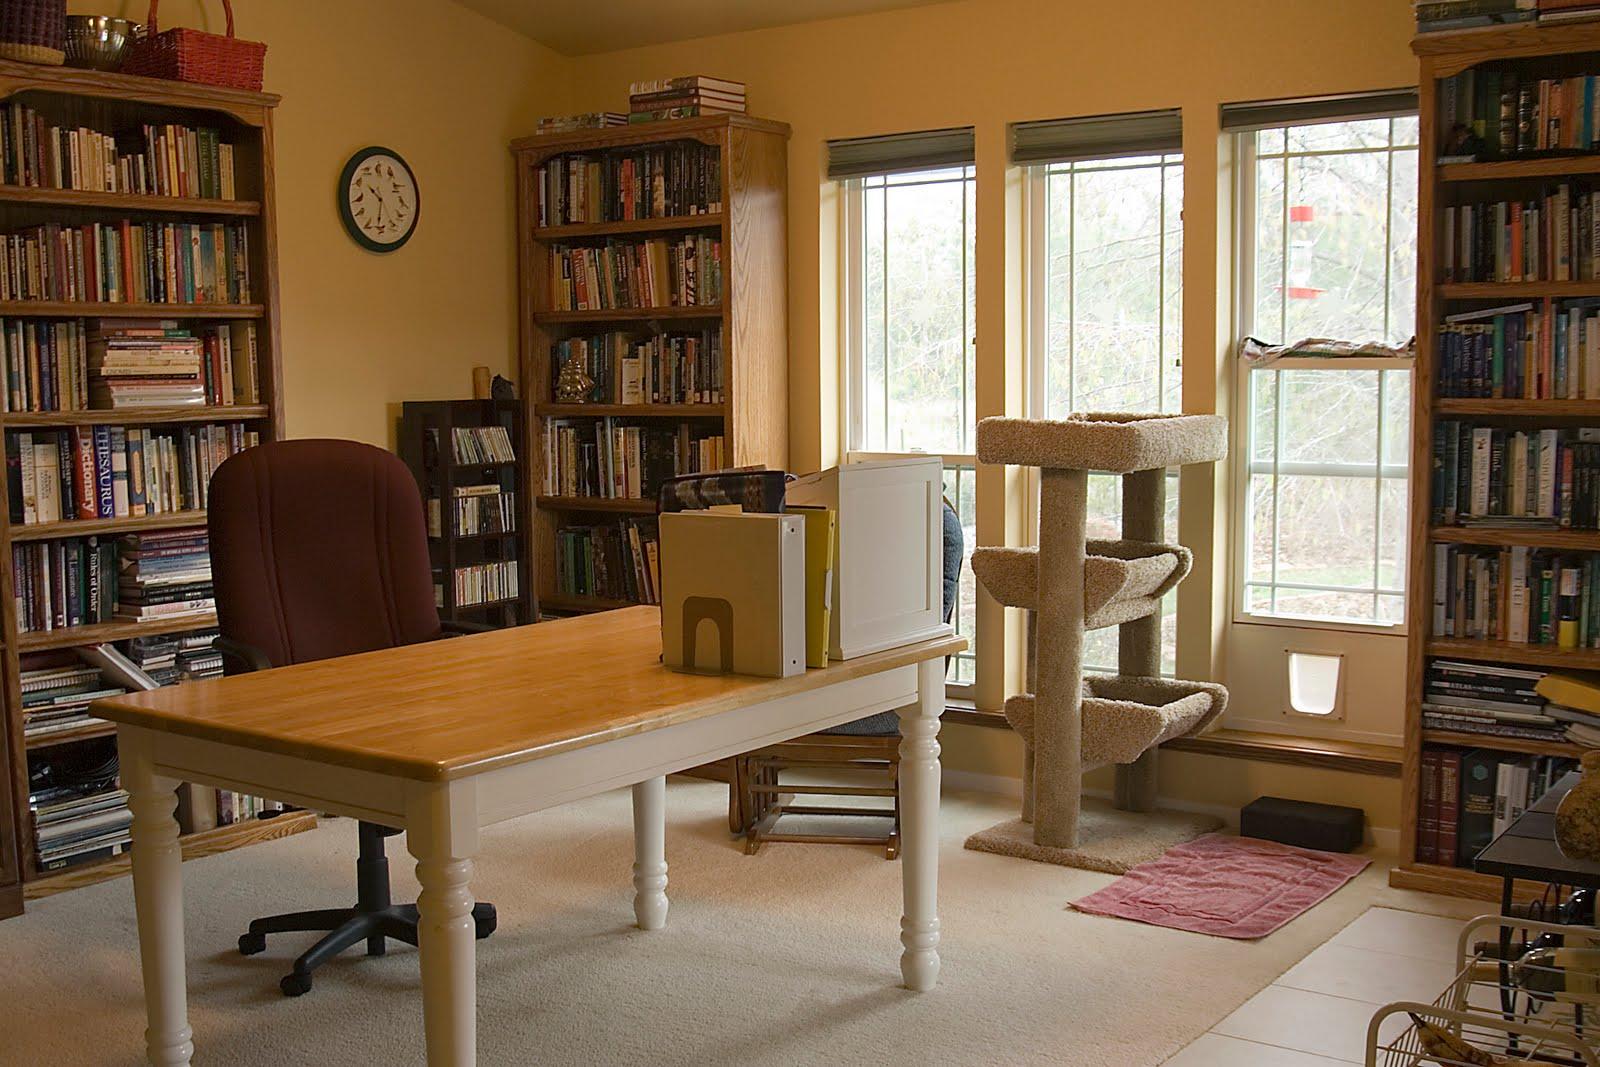 descriptive essay on your bedroom 91 121 113 106 descriptive essay on your bedroom